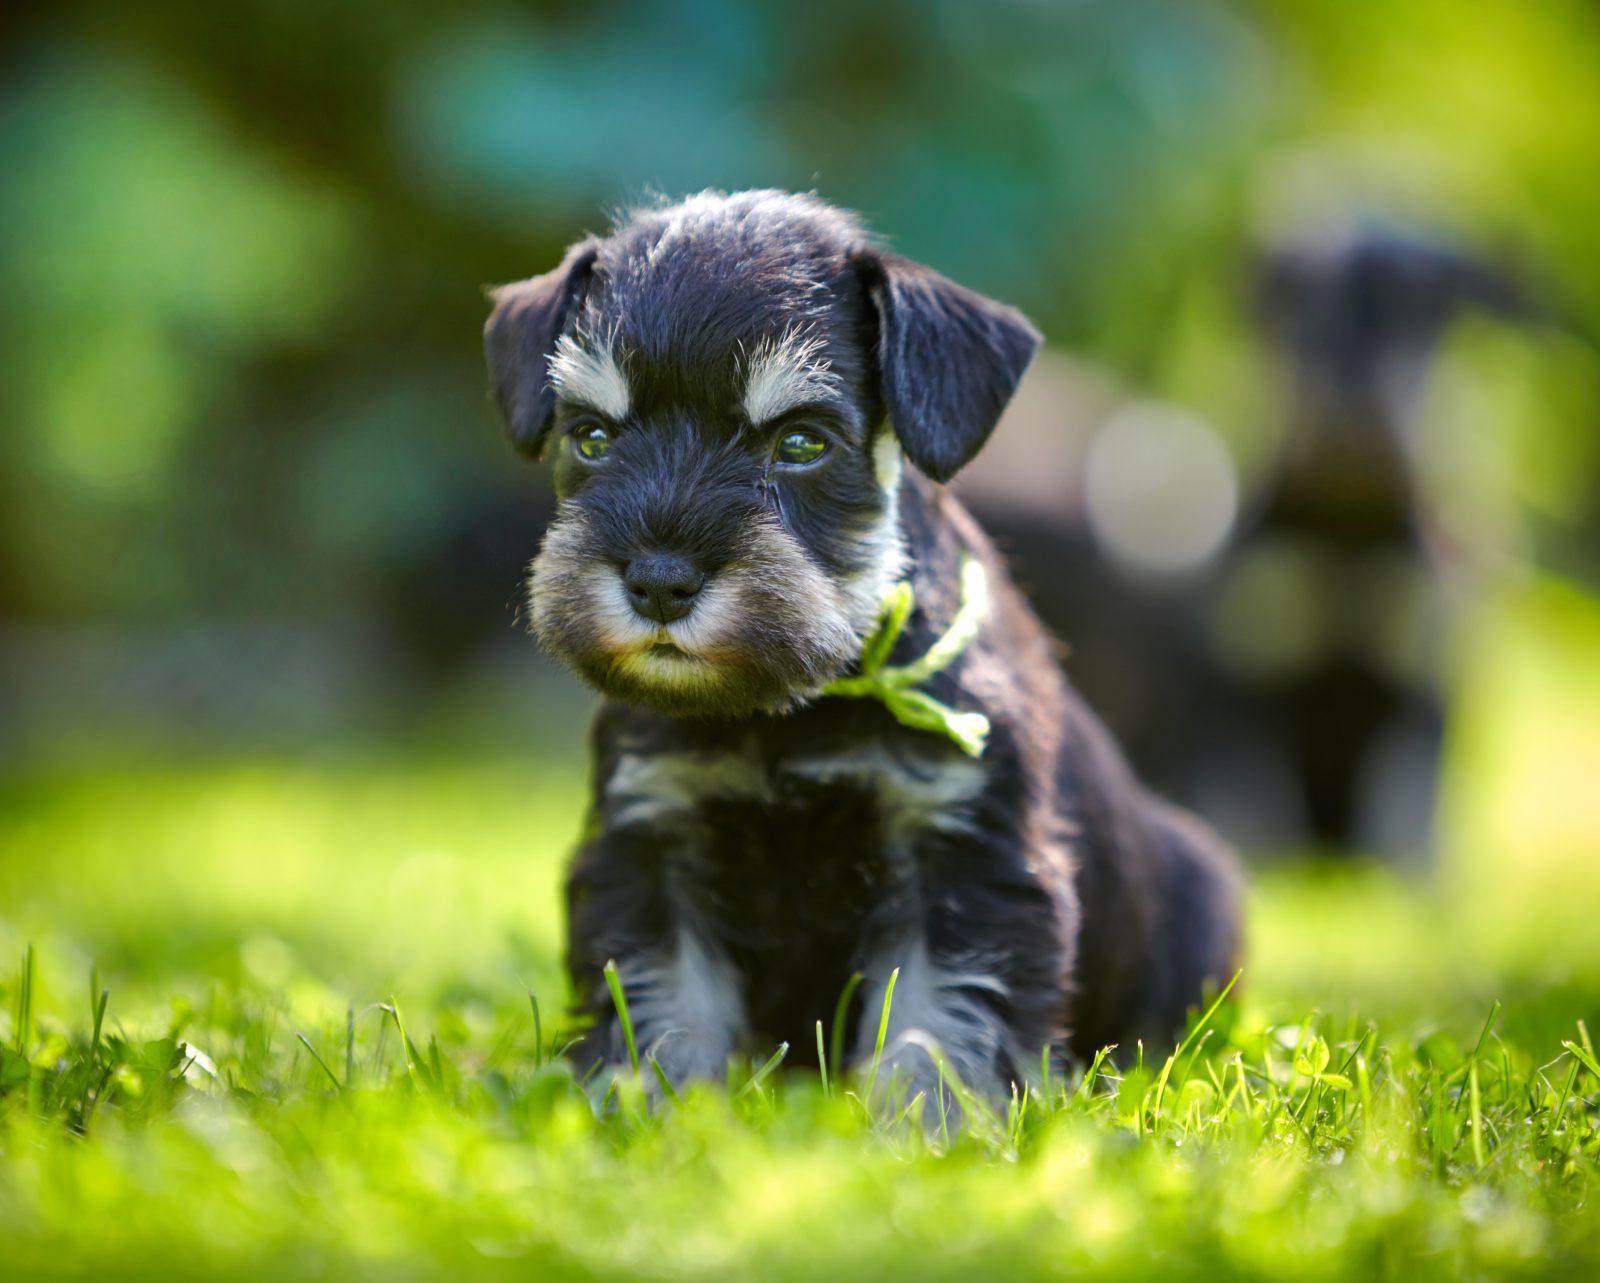 Cachorro latindo: Schnauzer miniatura filhote no gramado do jardim.